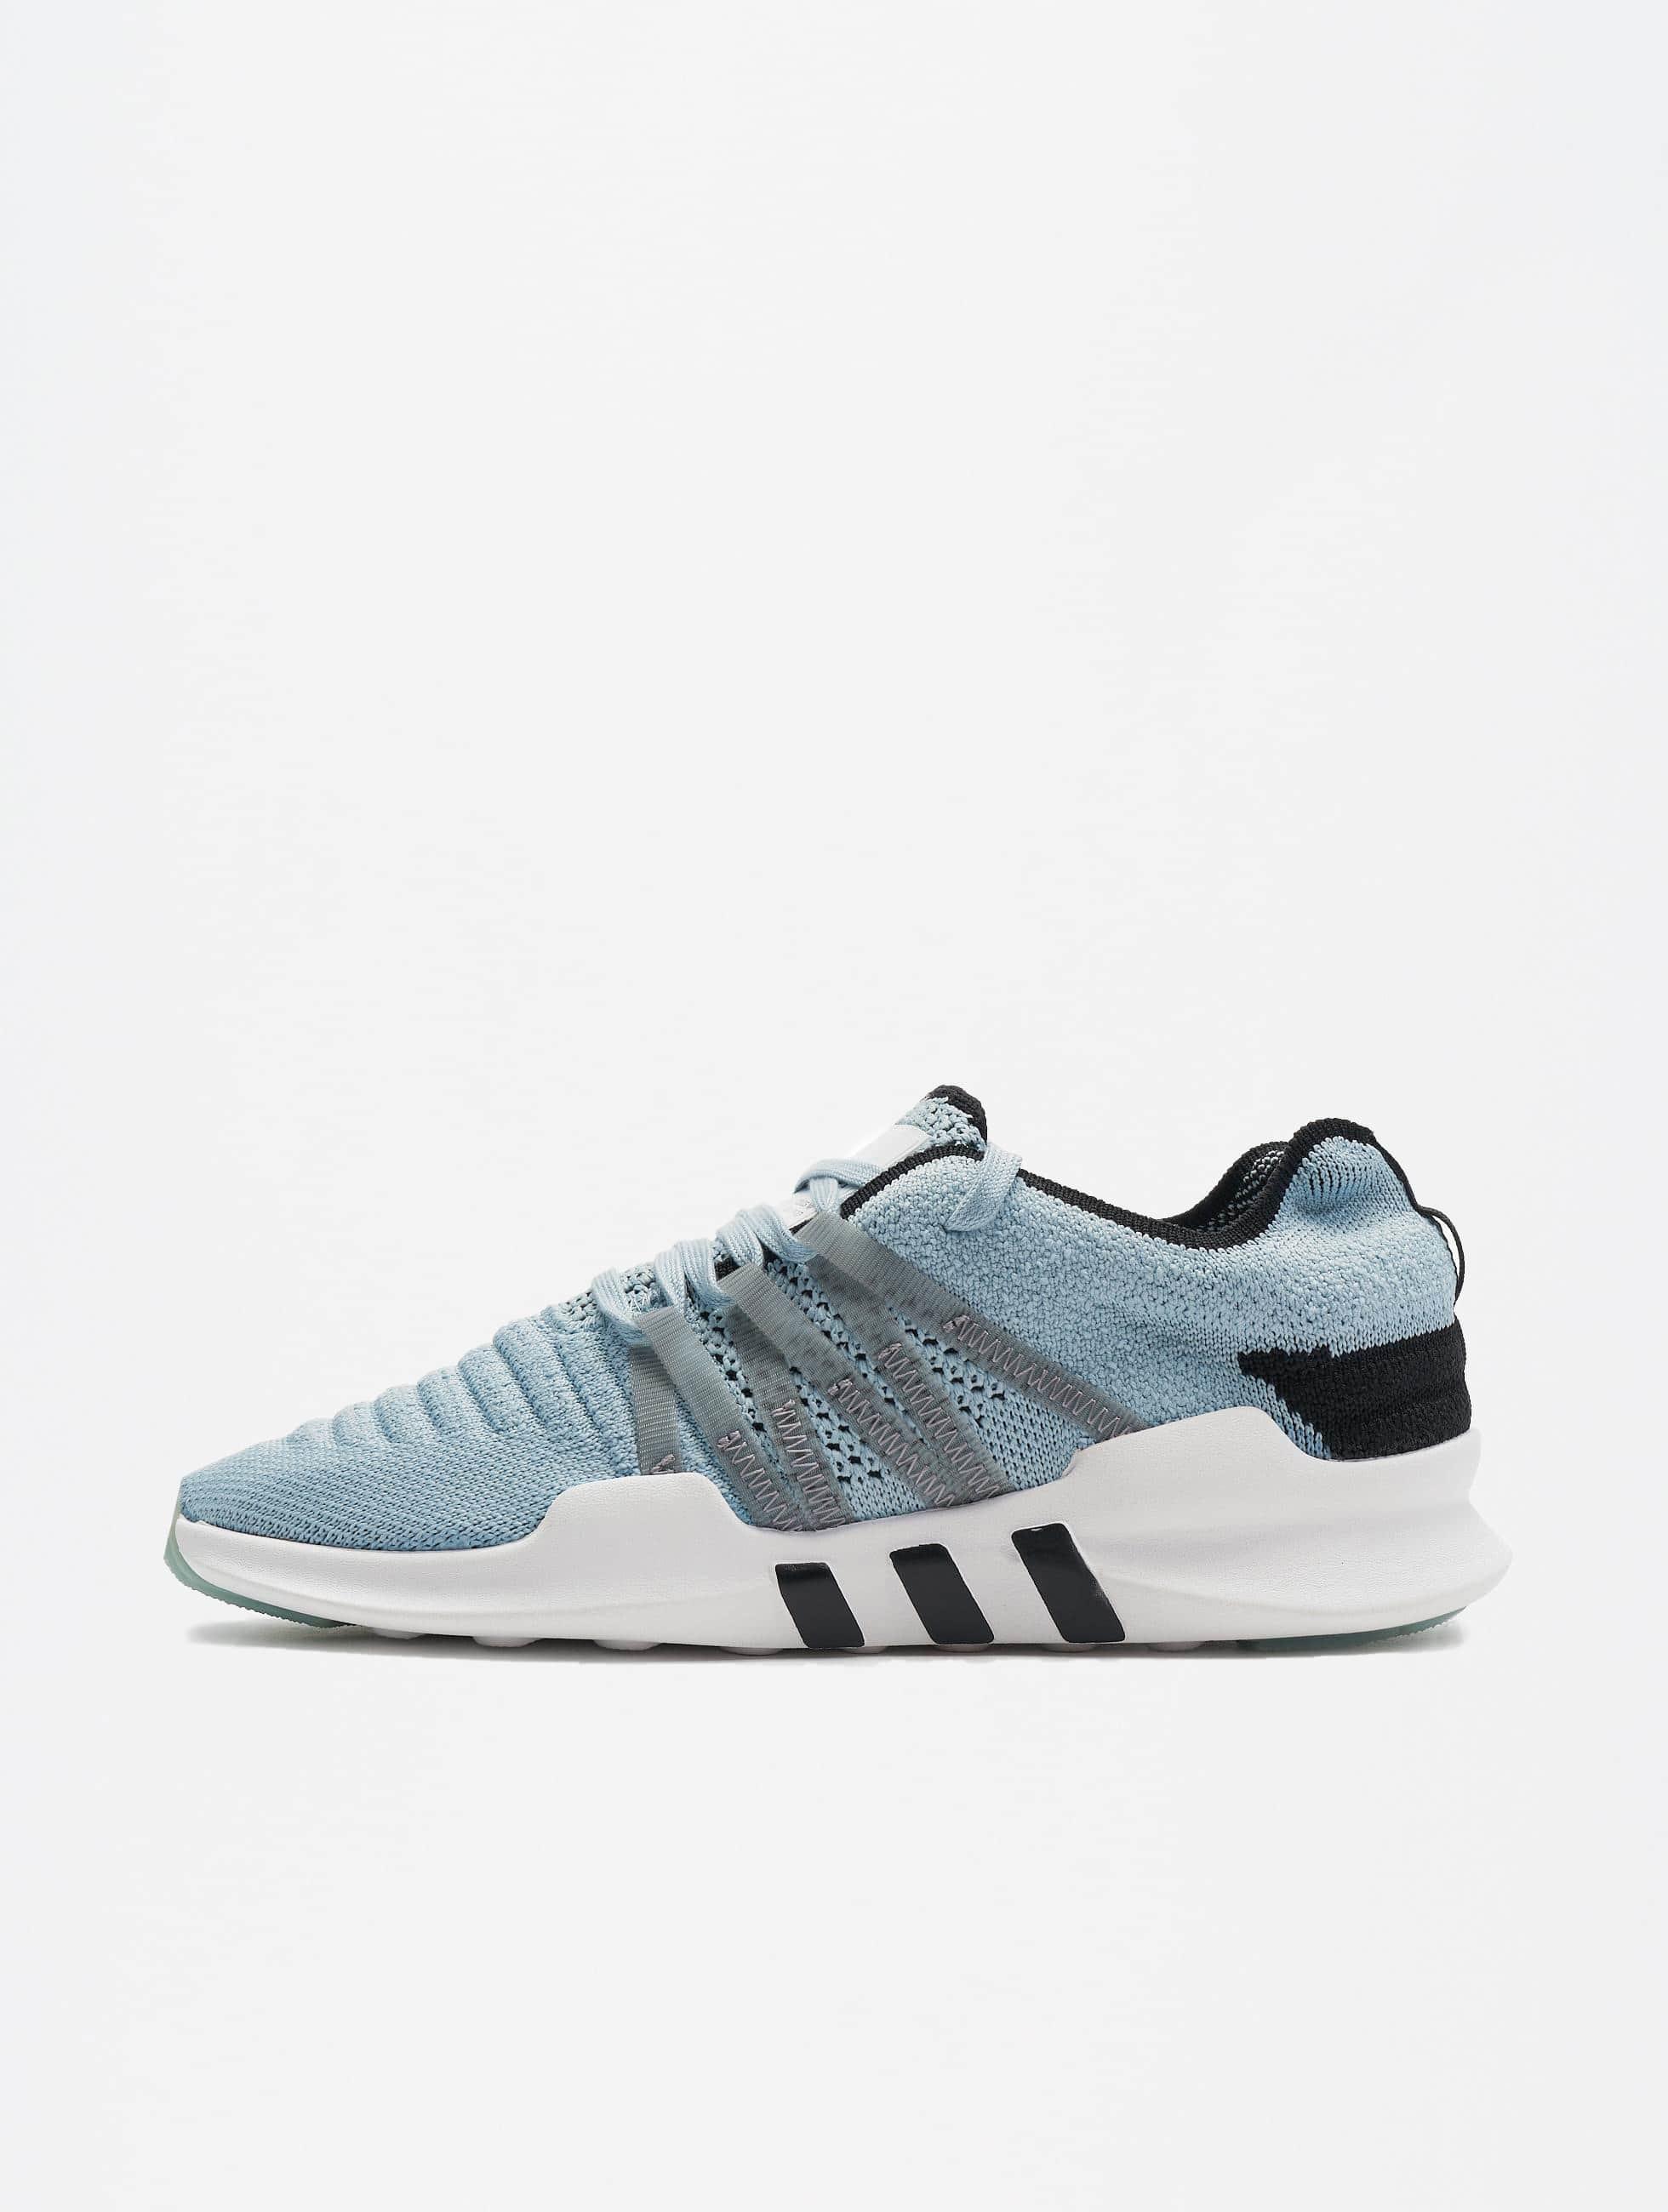 Adidas EQT Racing ADV Sneakers Blue